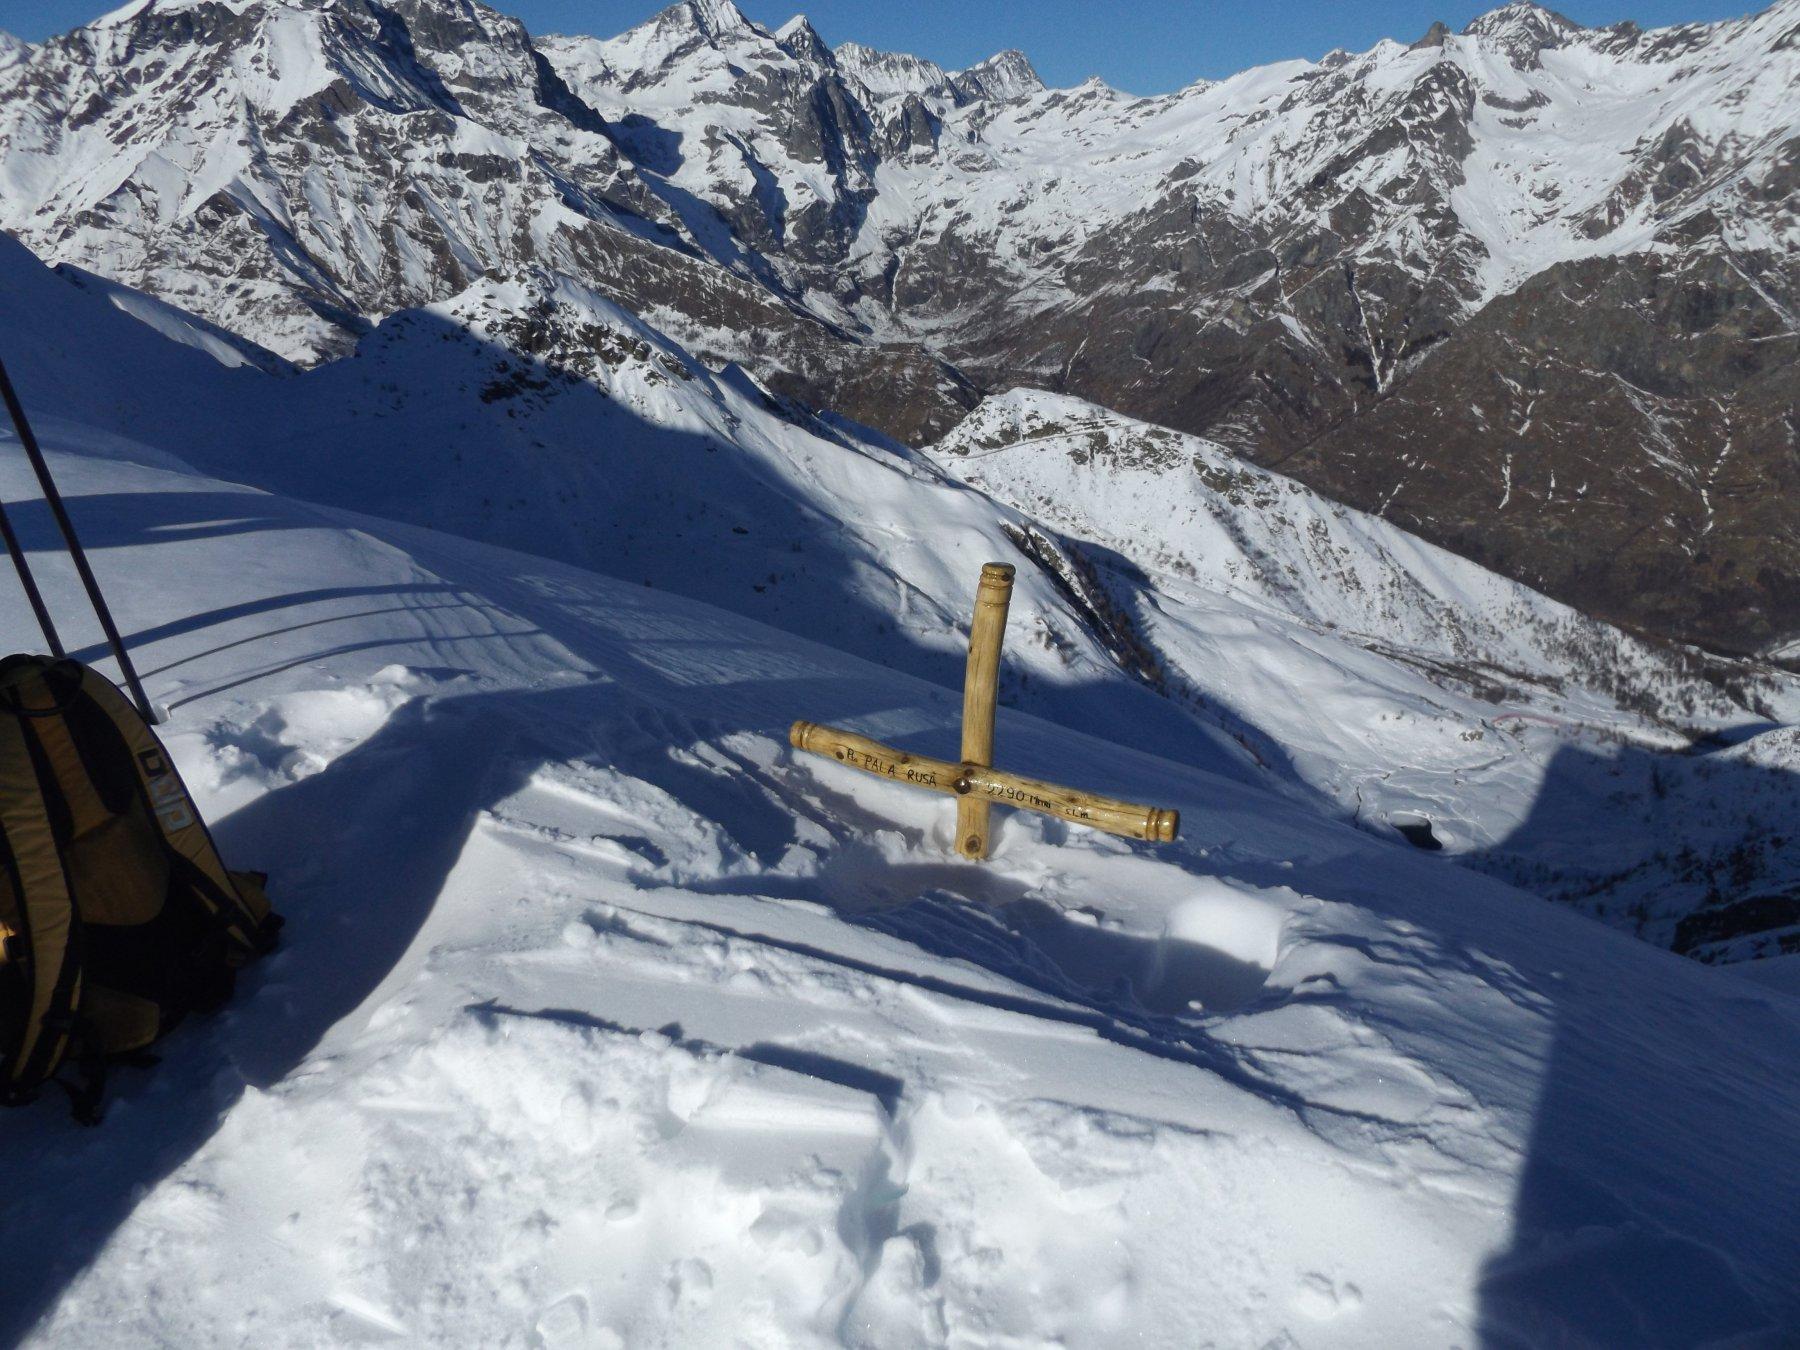 La croce di Pala Rusa emerge dalla neve